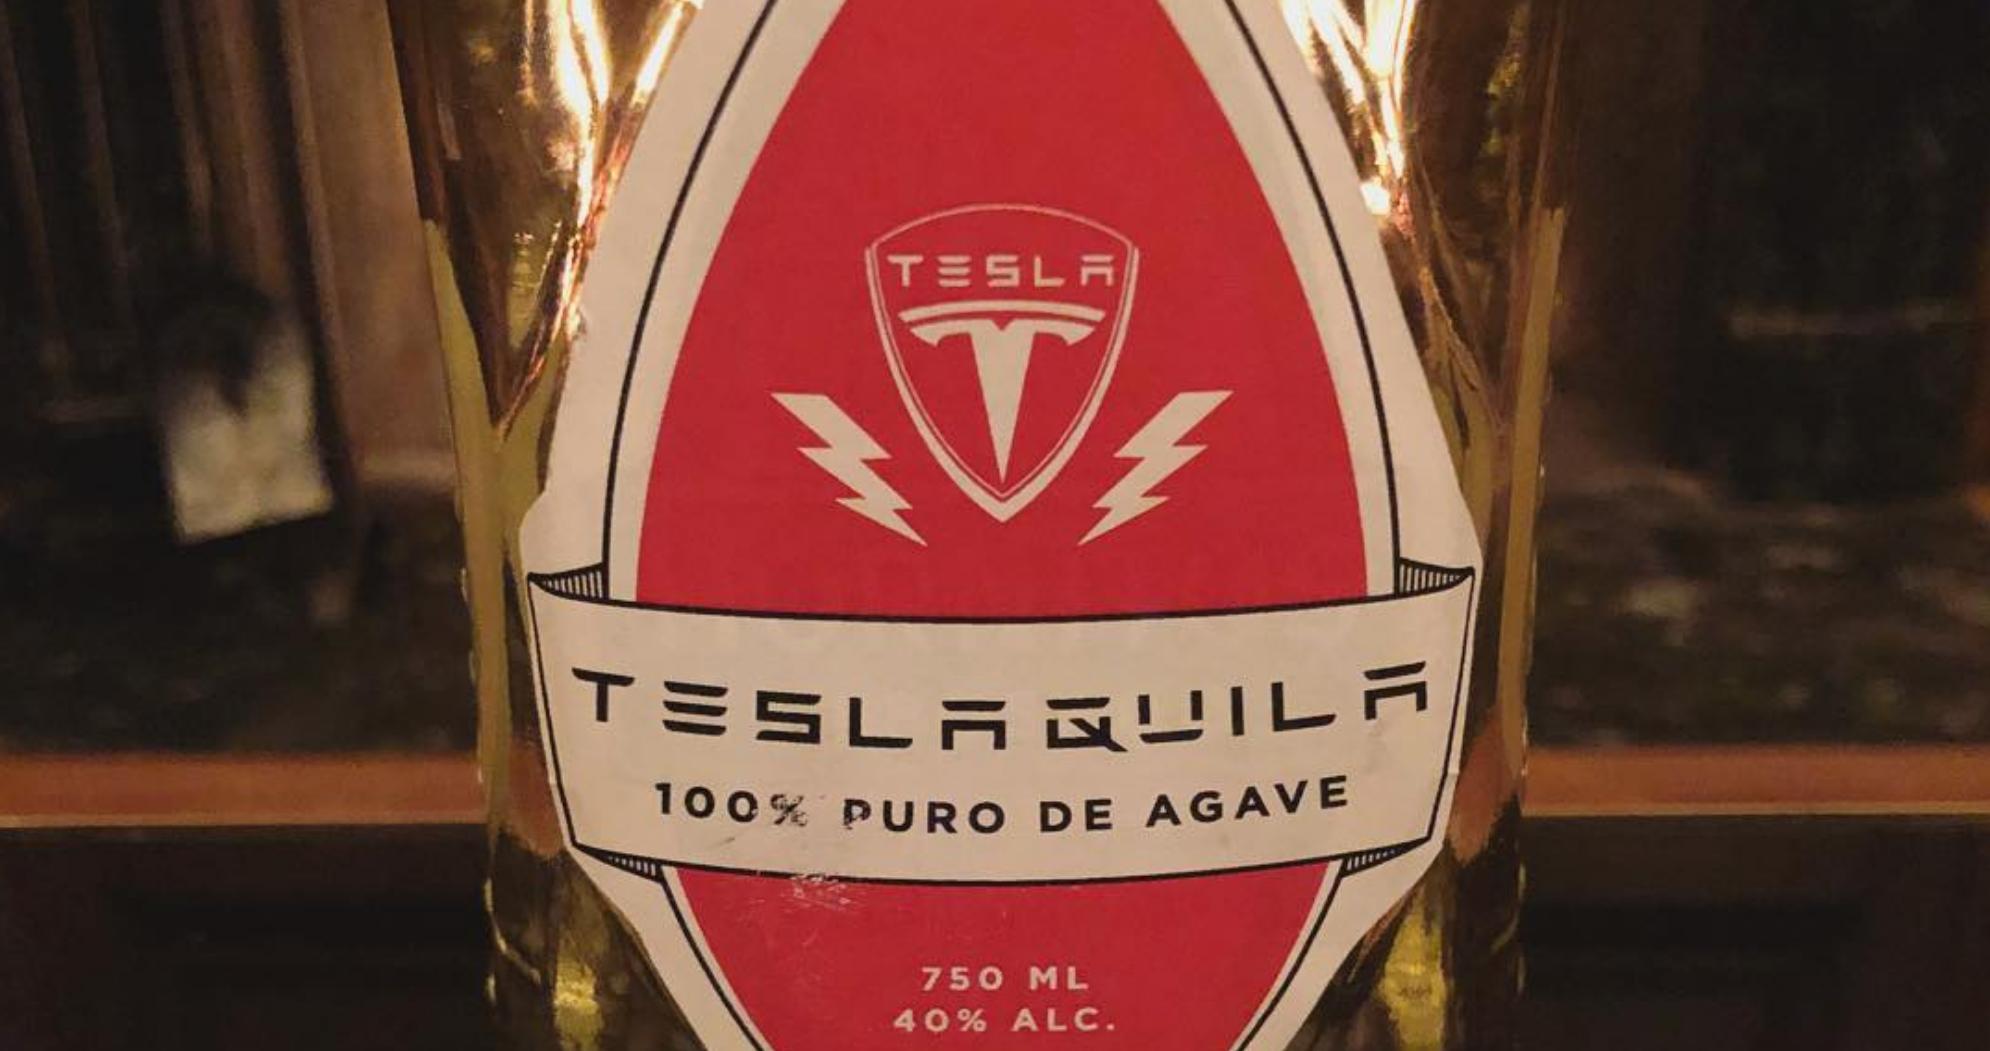 Tesla trece de la automobile la tequila